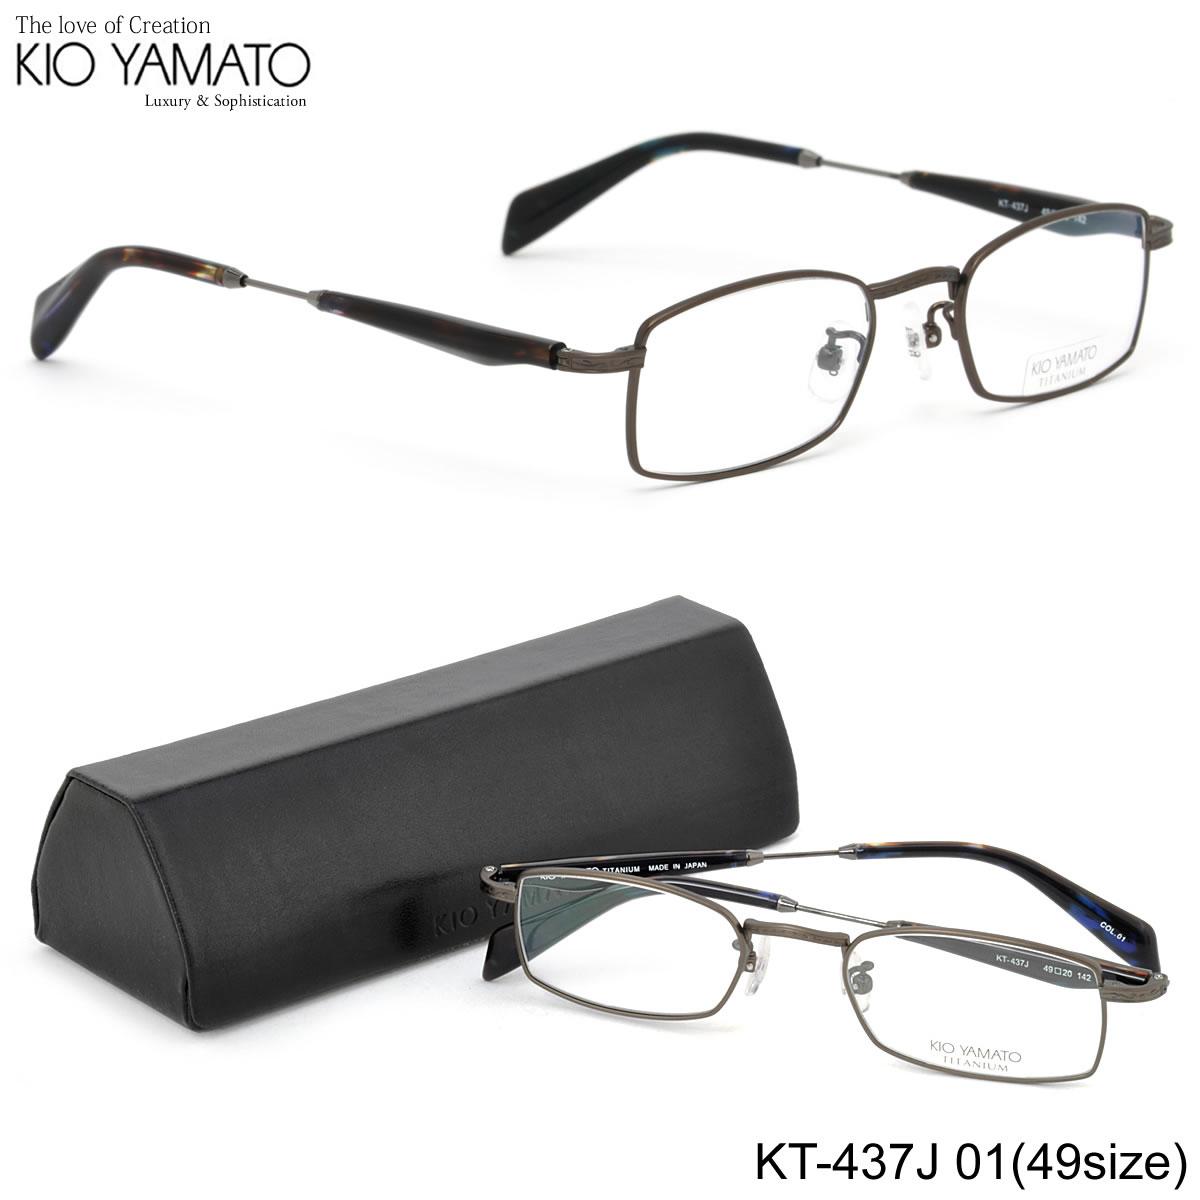 KIO d38941c YAMATO】(キオヤマト) オークリー OAKLEY メガネ フレーム ...